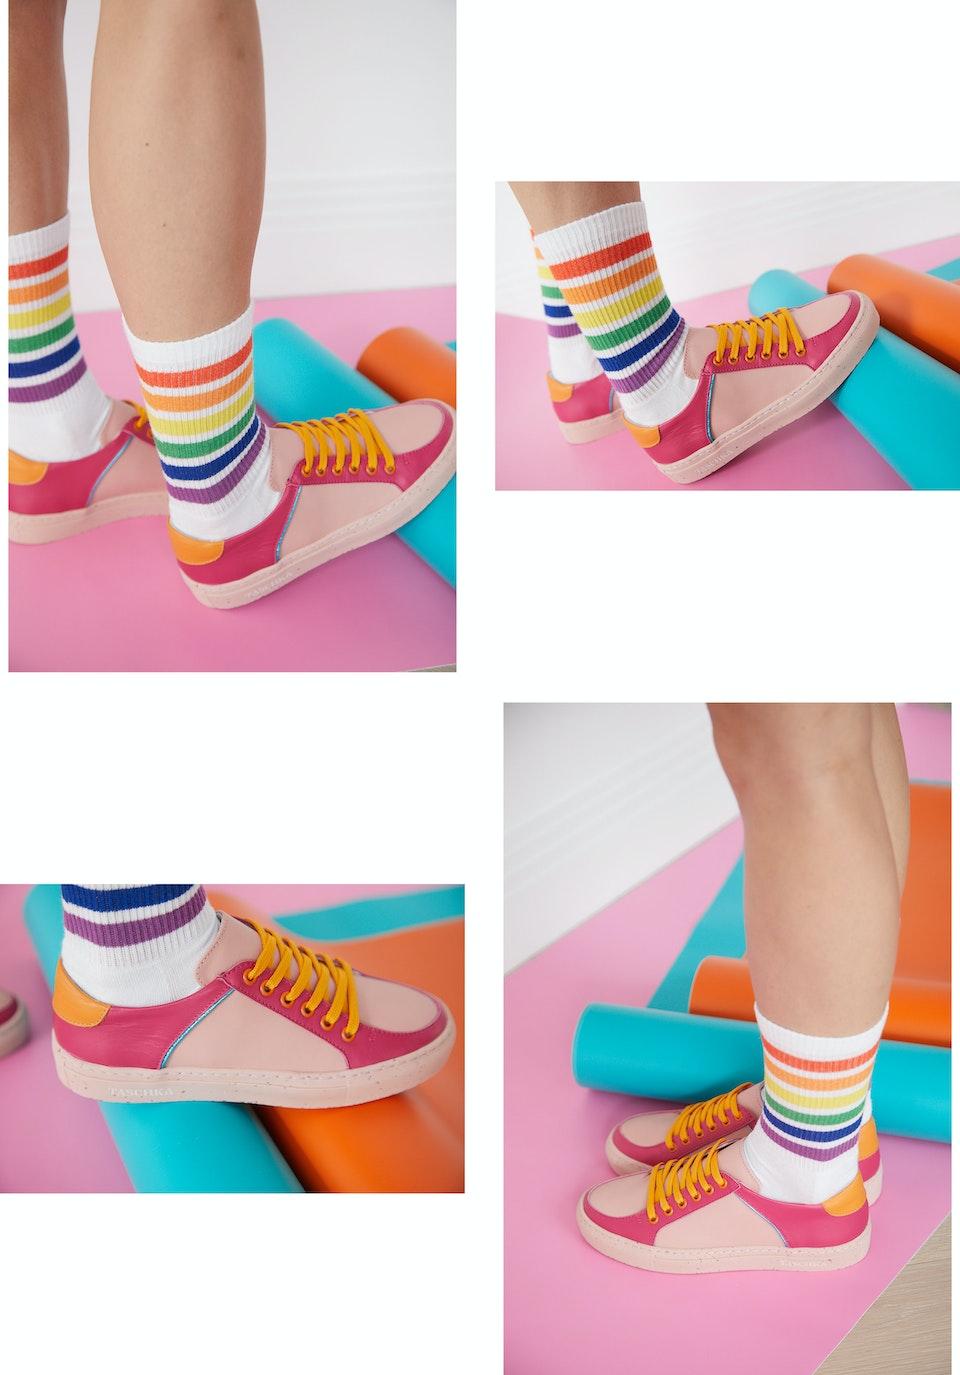 TaschkaShoes_008 -